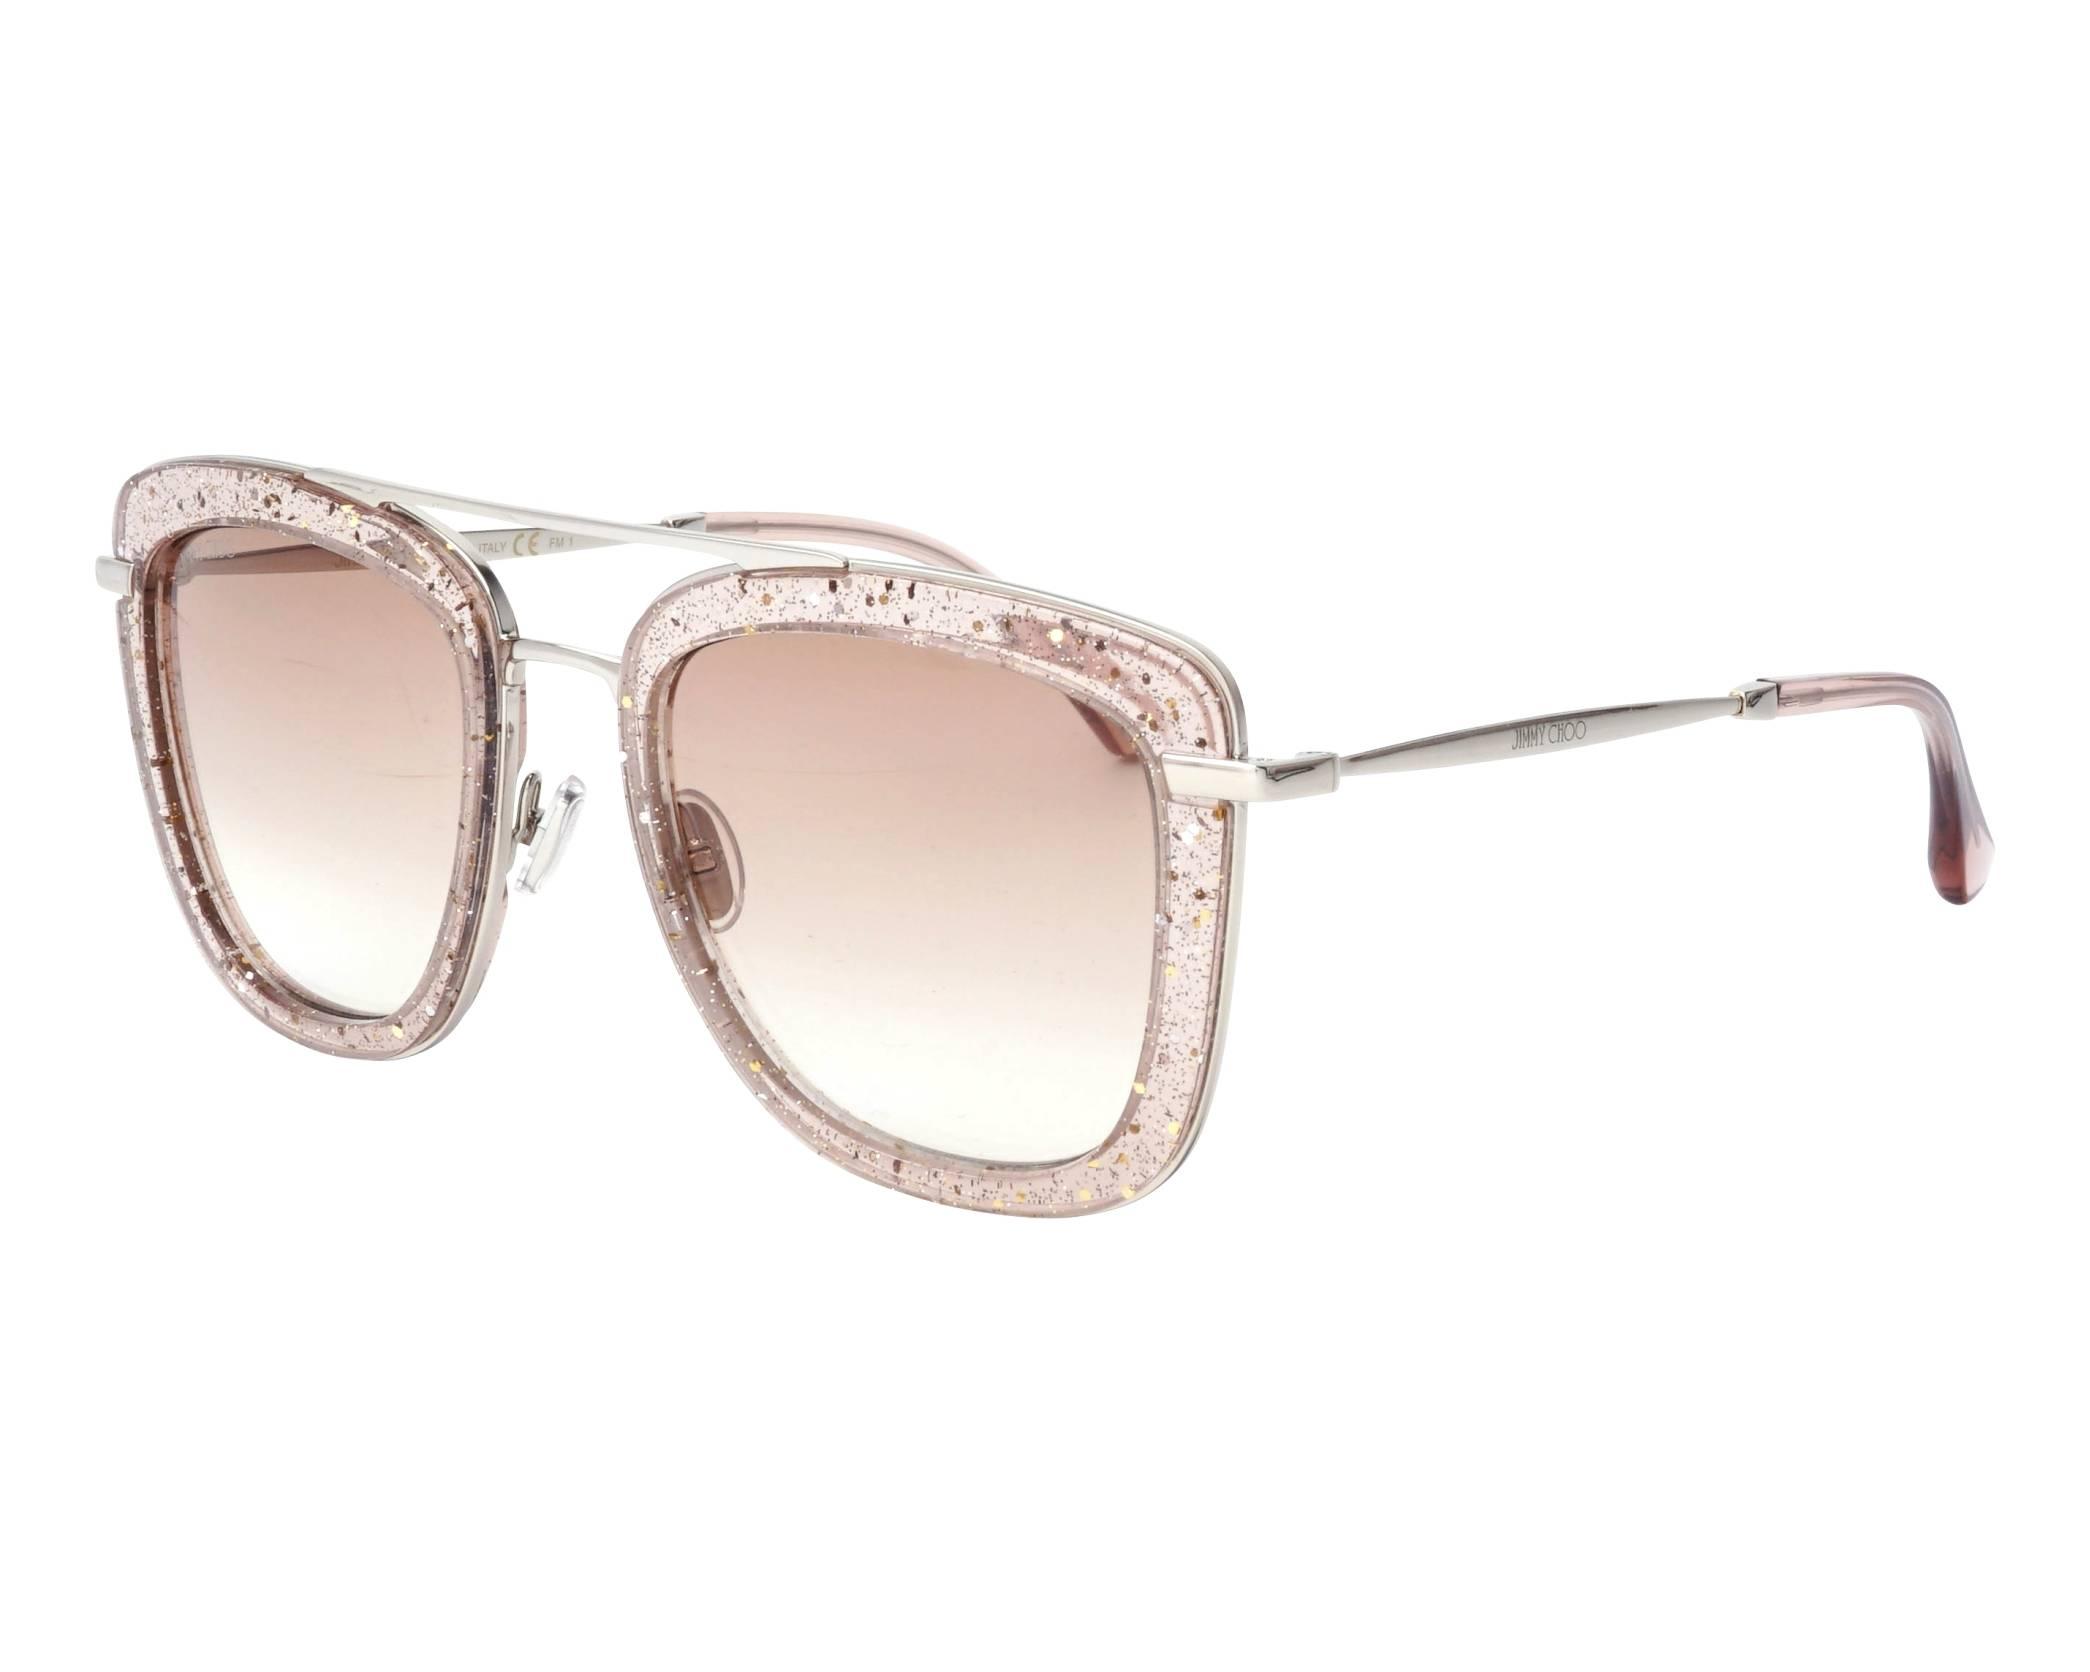 6126ea0c427 Sunglasses Jimmy Choo GLOSSY-S FWMHA 53-21 Mix Silver profile view